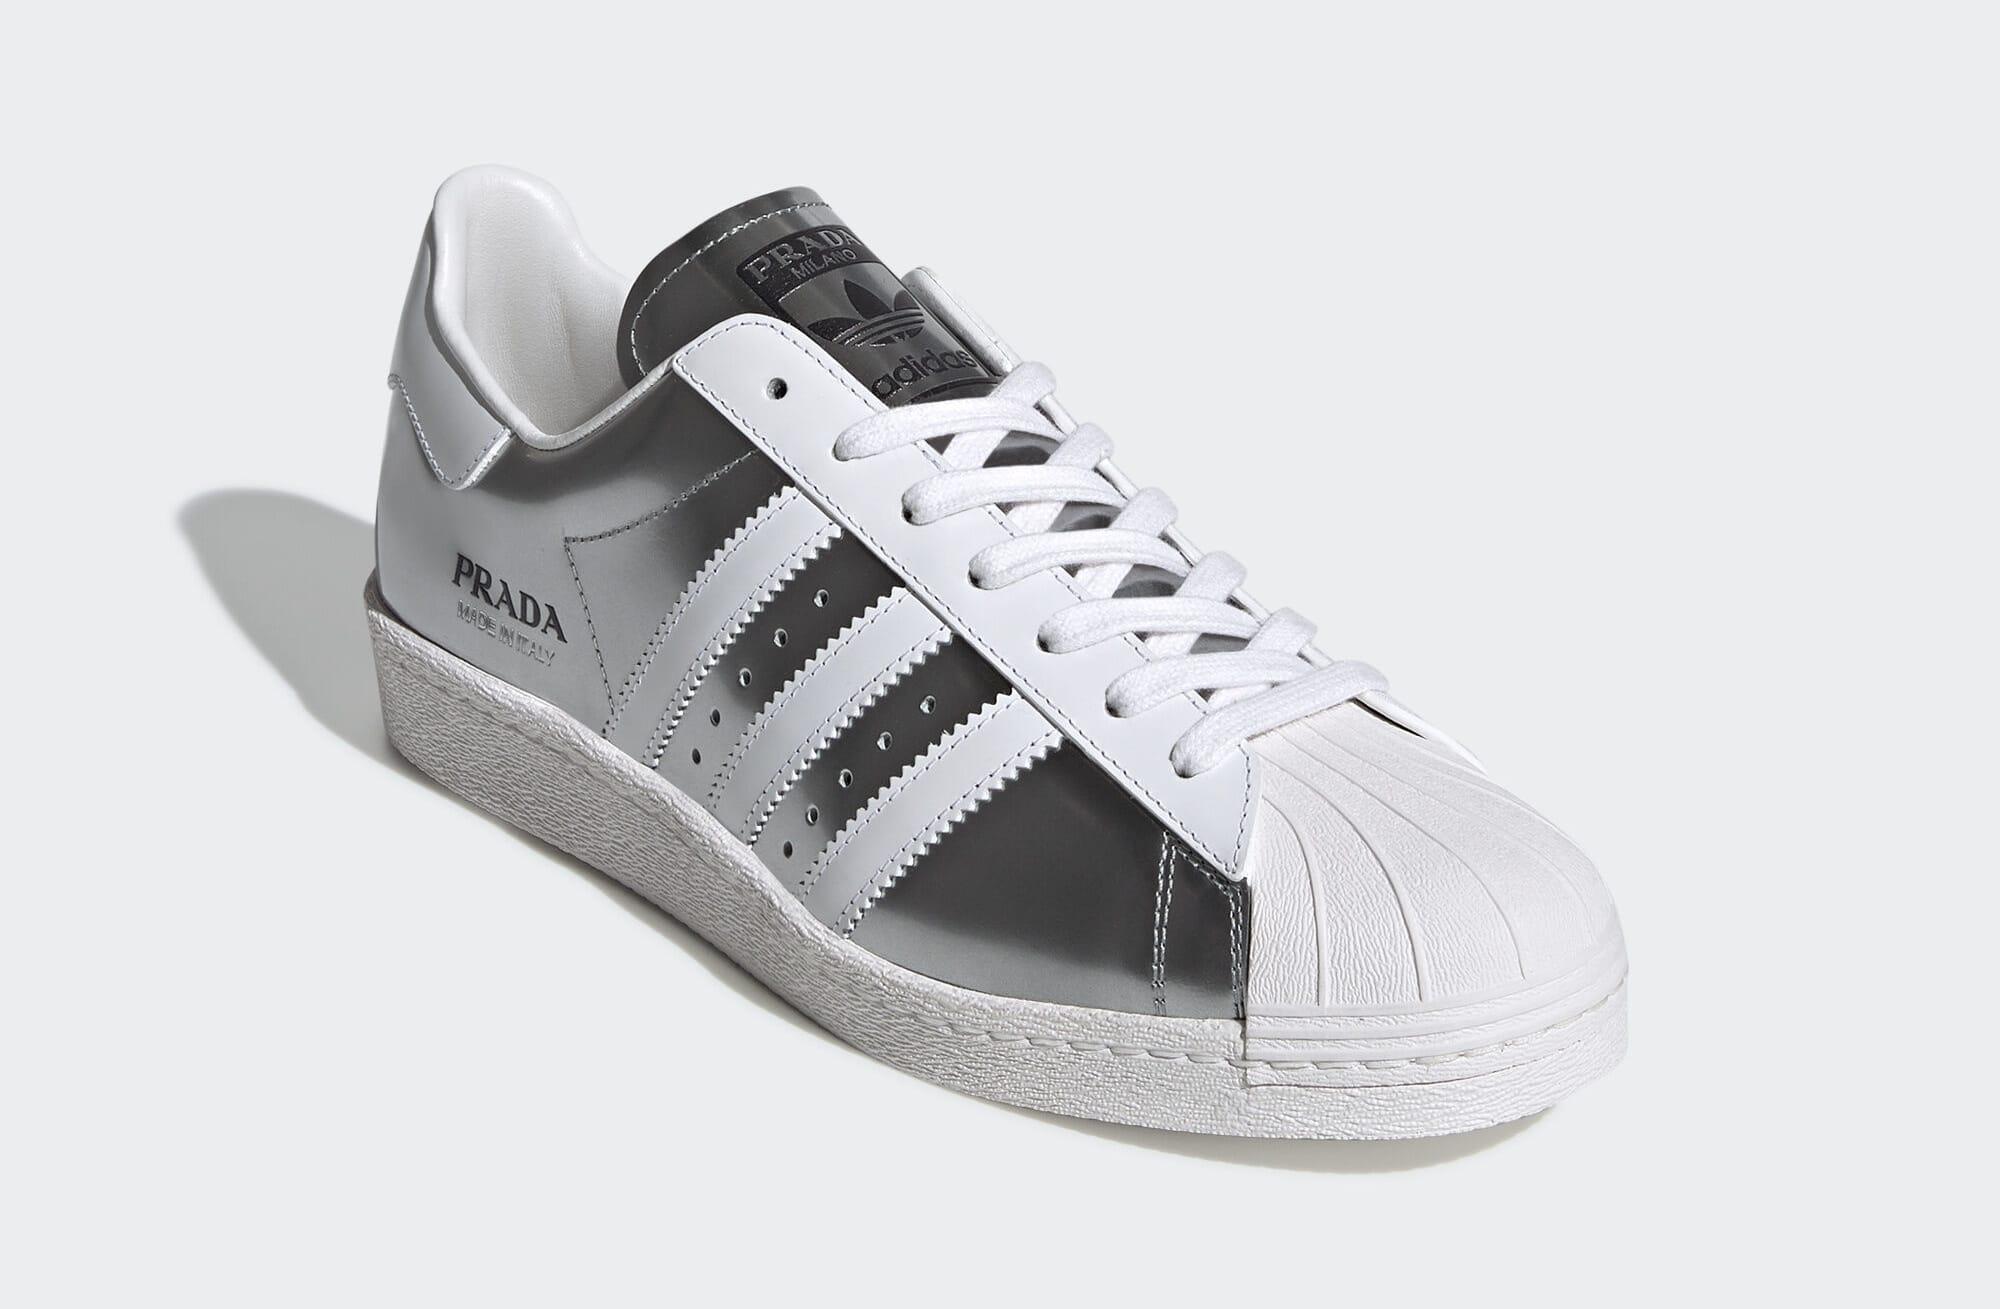 Prada x Adidas Superstar 'Silver Metallic' FX4546 (Front)